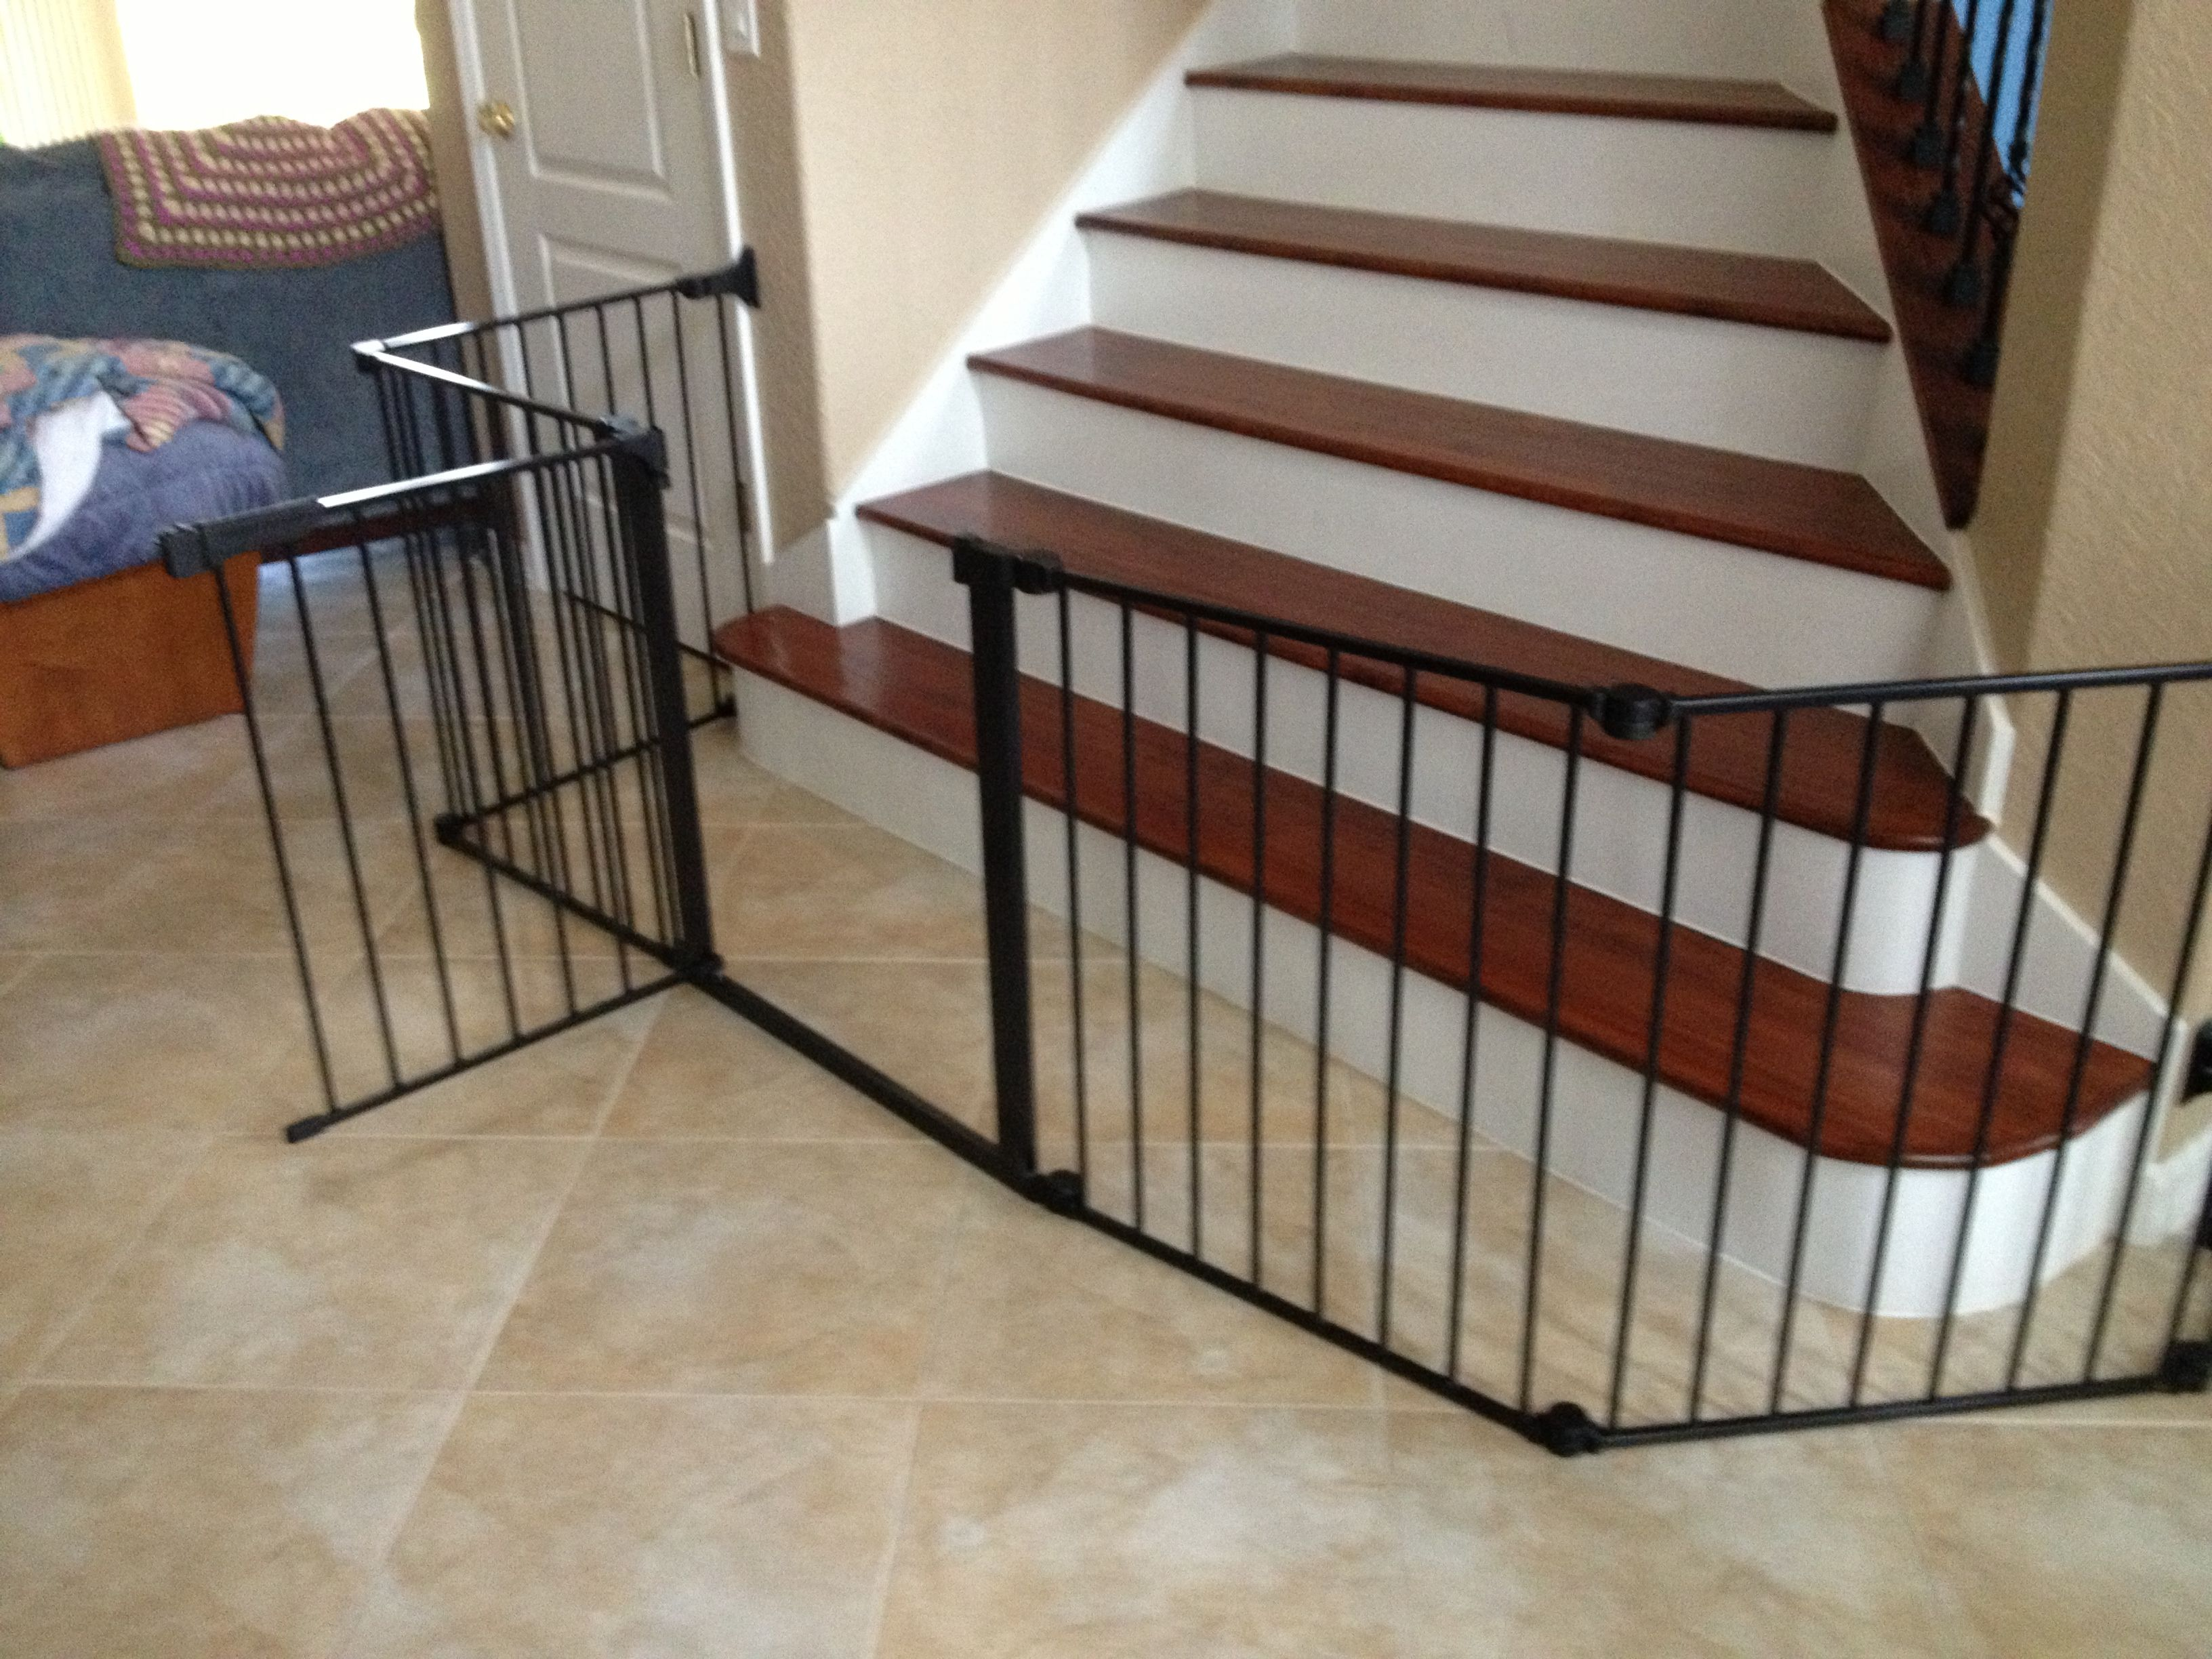 1000 ideas about ba gates stairs on pinterest ba gates